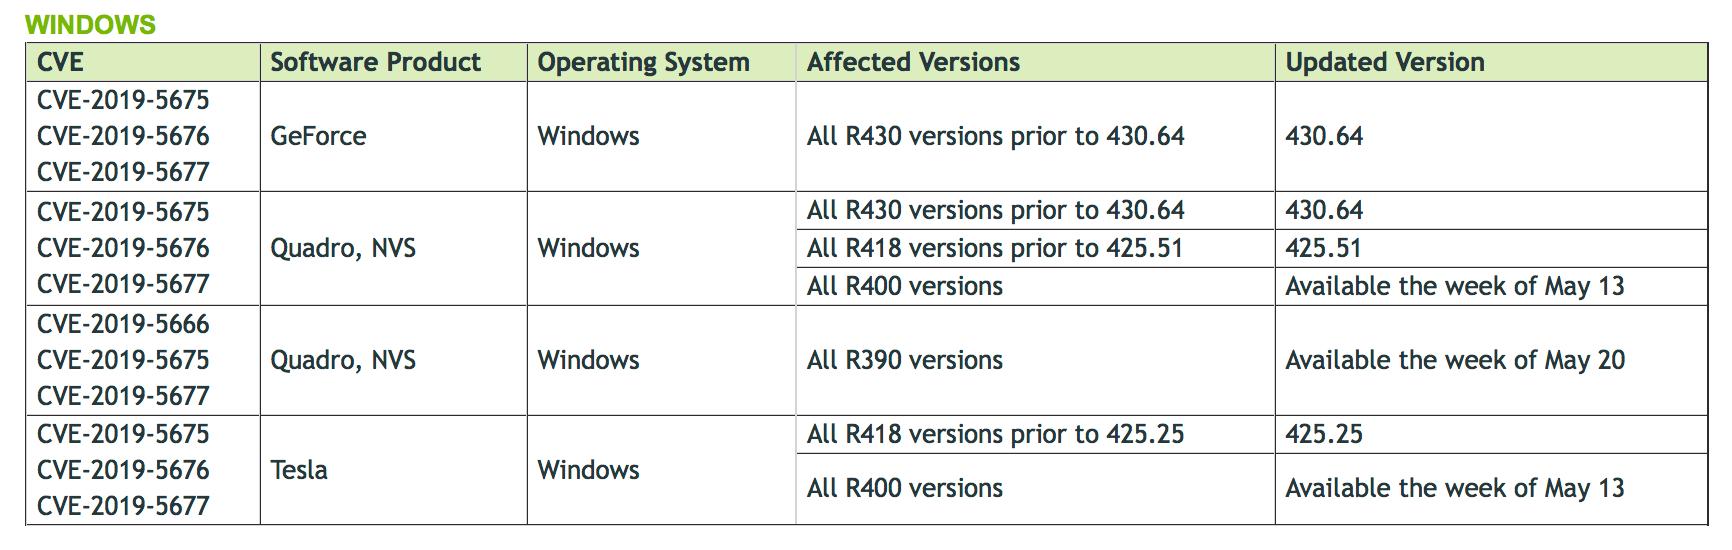 Nvidia Warns Windows Gamers on GPU Driver Flaws : Games